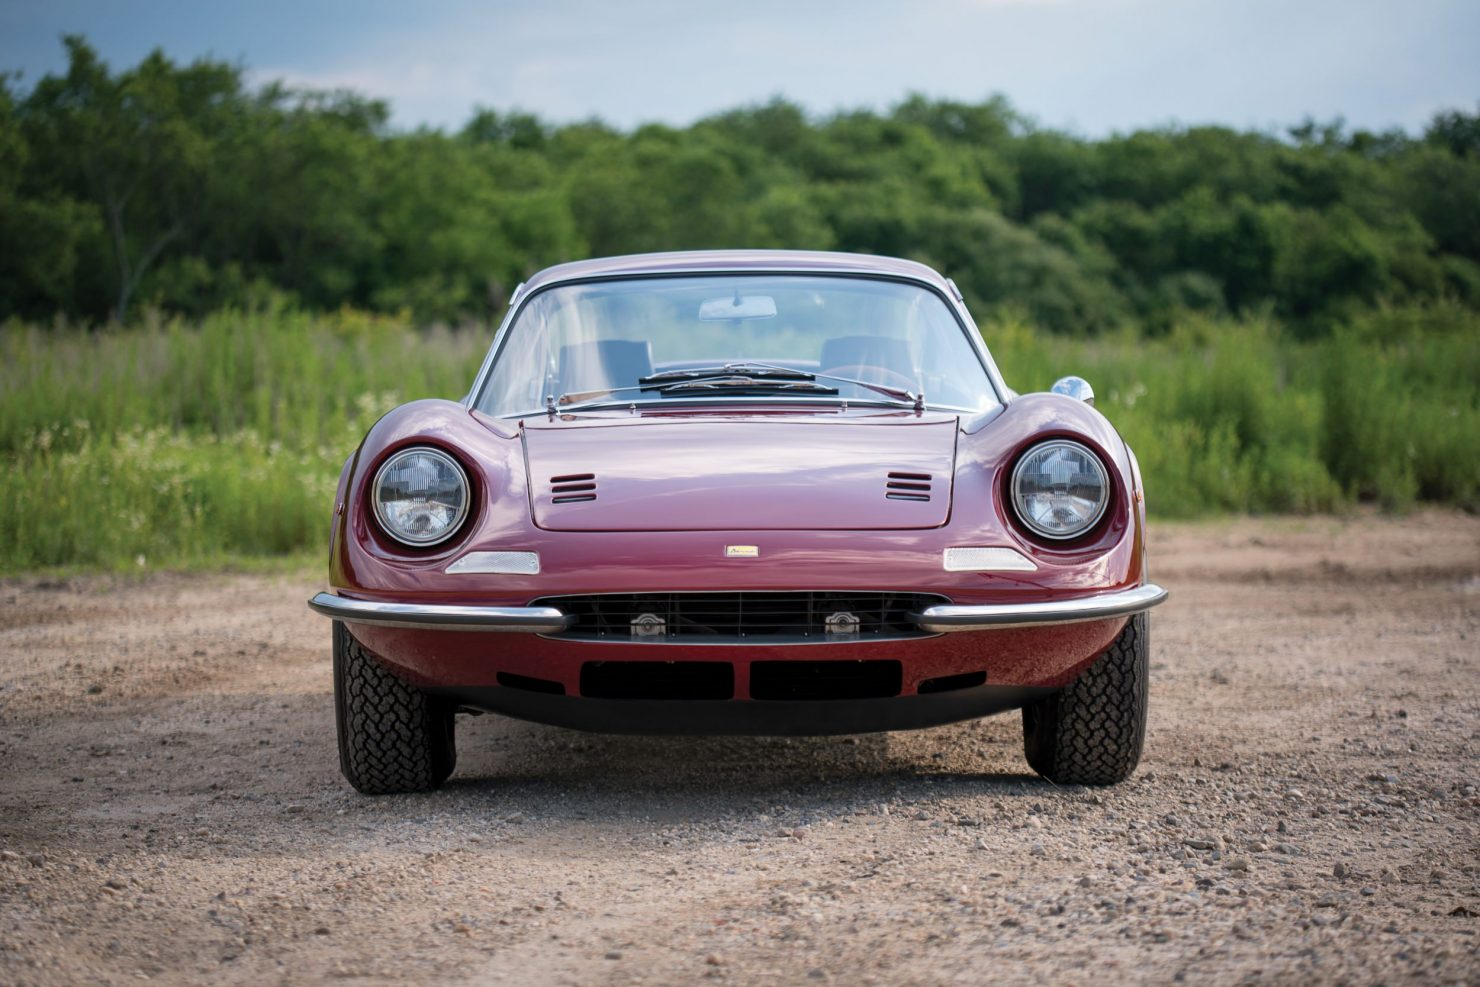 ferrari dino 246 9 1480x987 - 1969 Ferrari Dino 246 GT